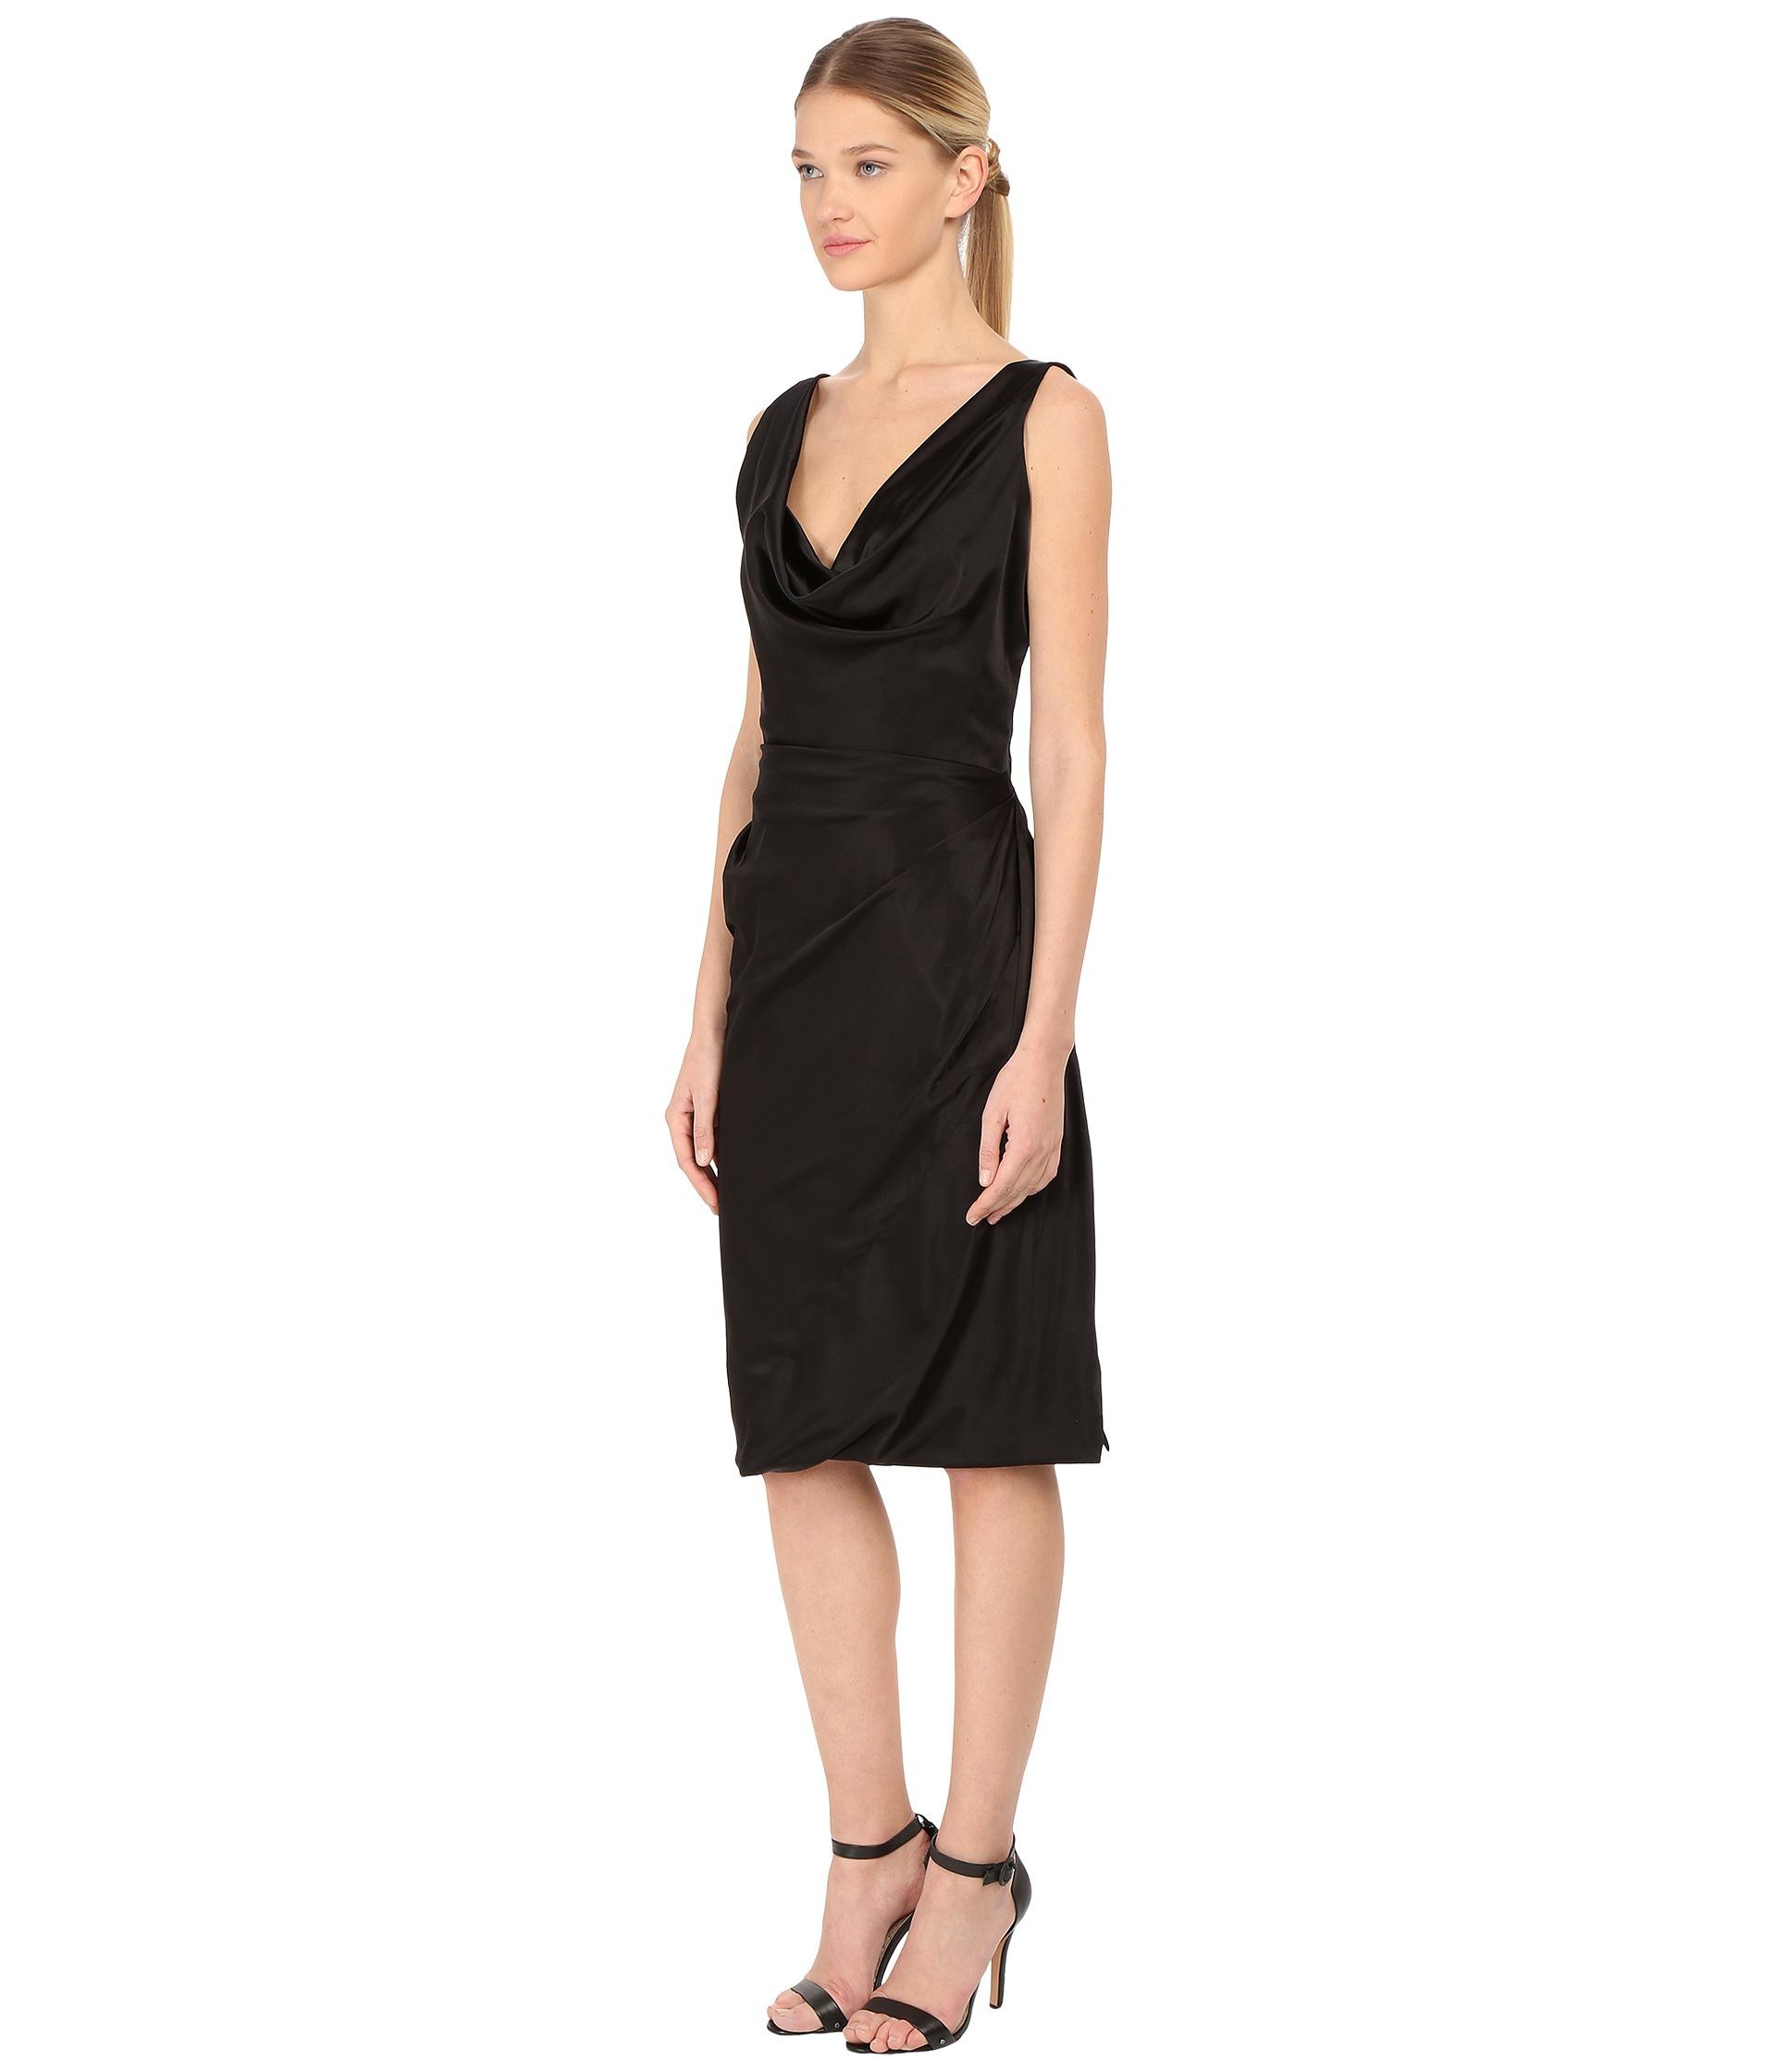 9cca5732f70 Vivienne Westwood Red Label Stretch Satin Short Amber Dress in Black ...